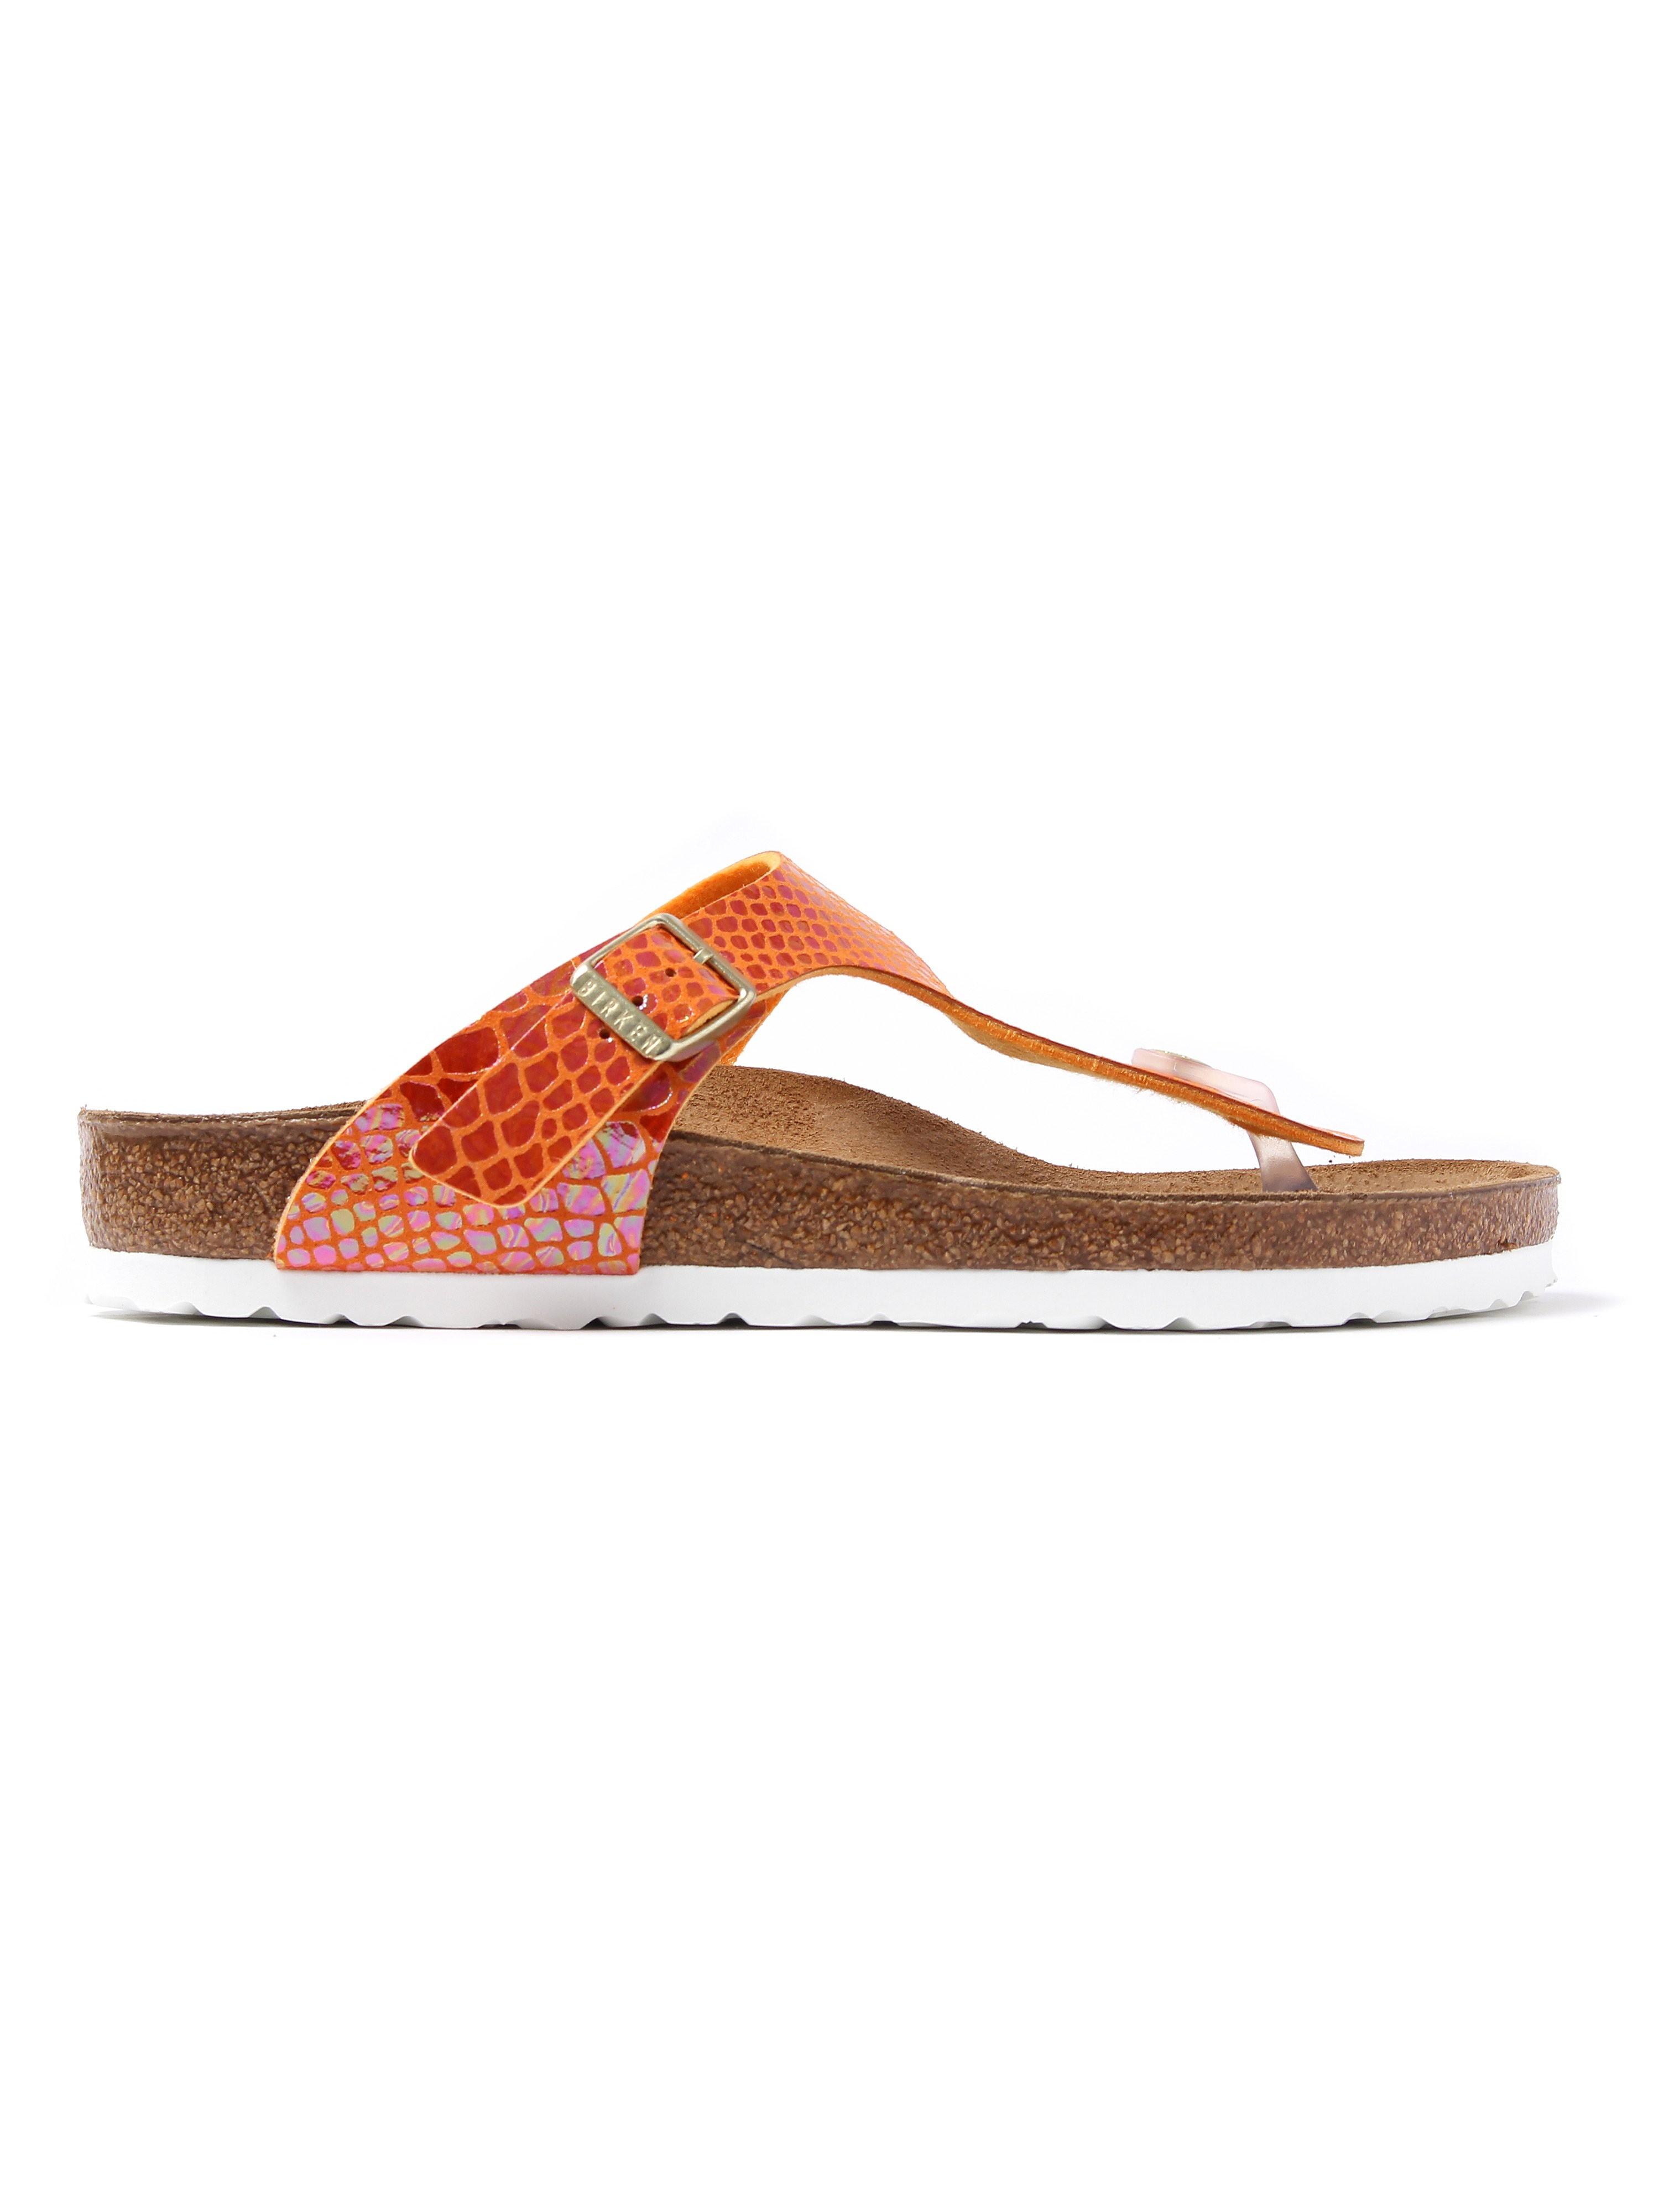 Birkenstock Women's Gizeh Regular Fit Sandals -  Orange Snake Skin